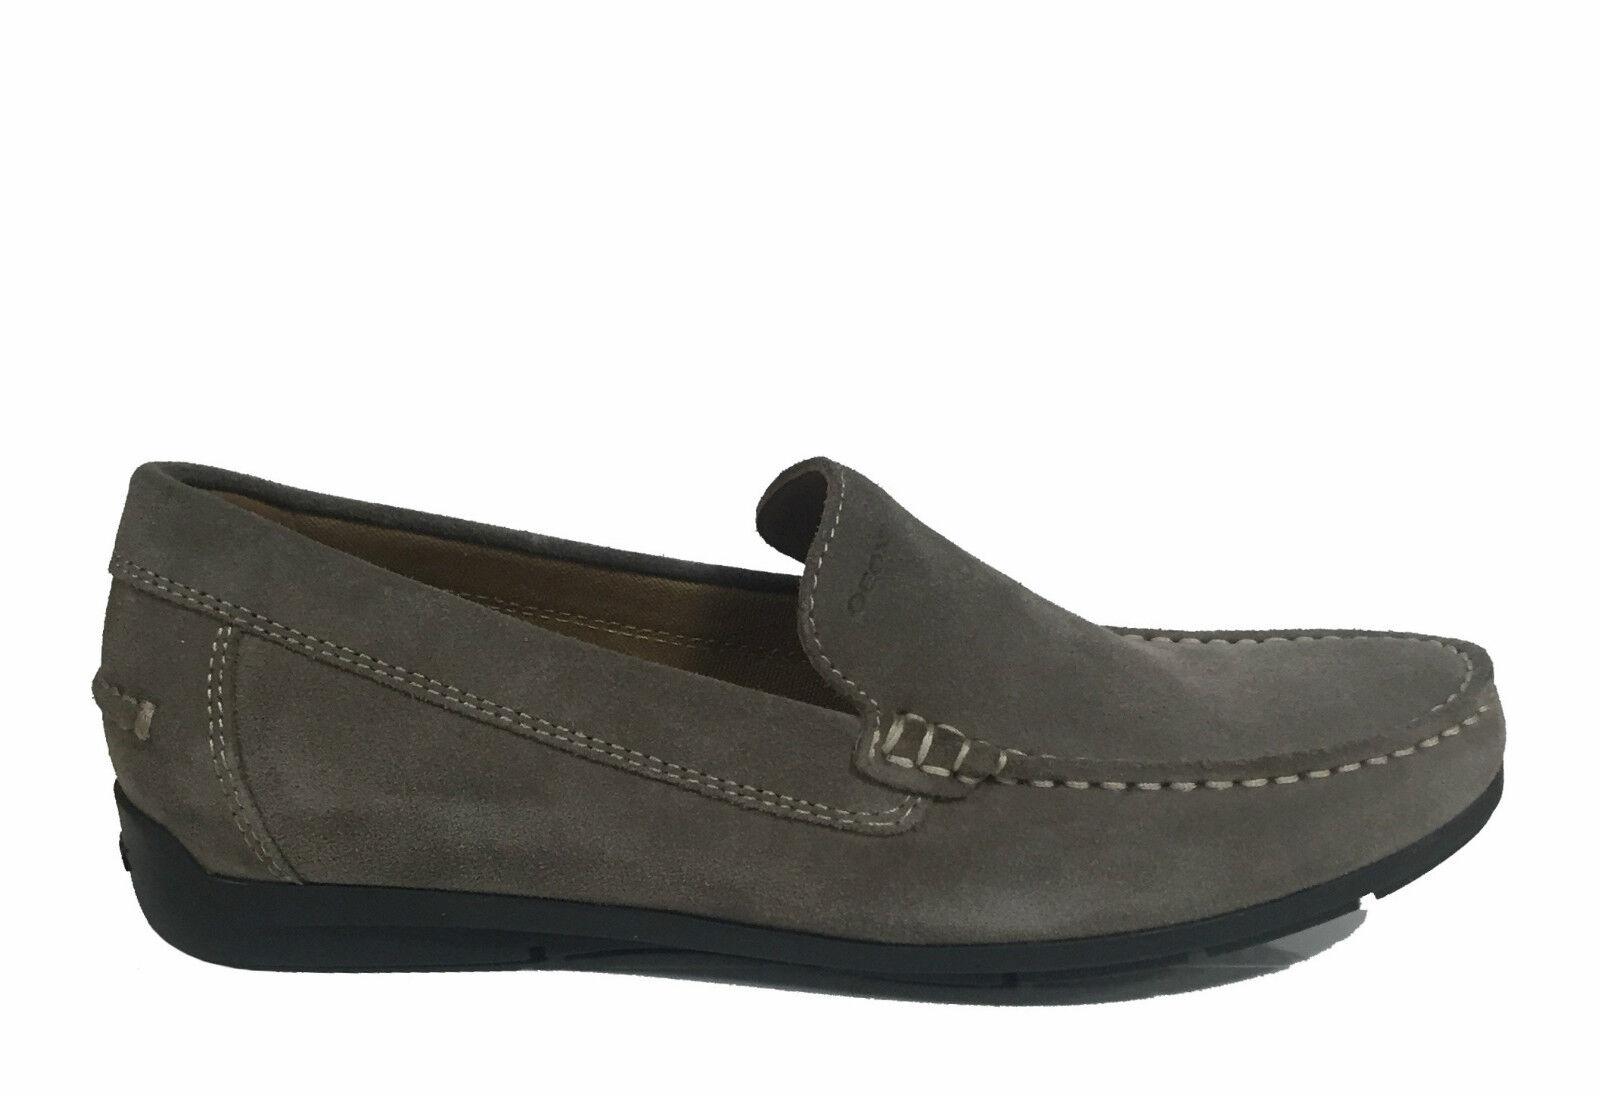 GEOX shoes men, MOCASSINI IN MORBIDO CAMOSCIO TAUPE, LINEA SIMON U32Q3A